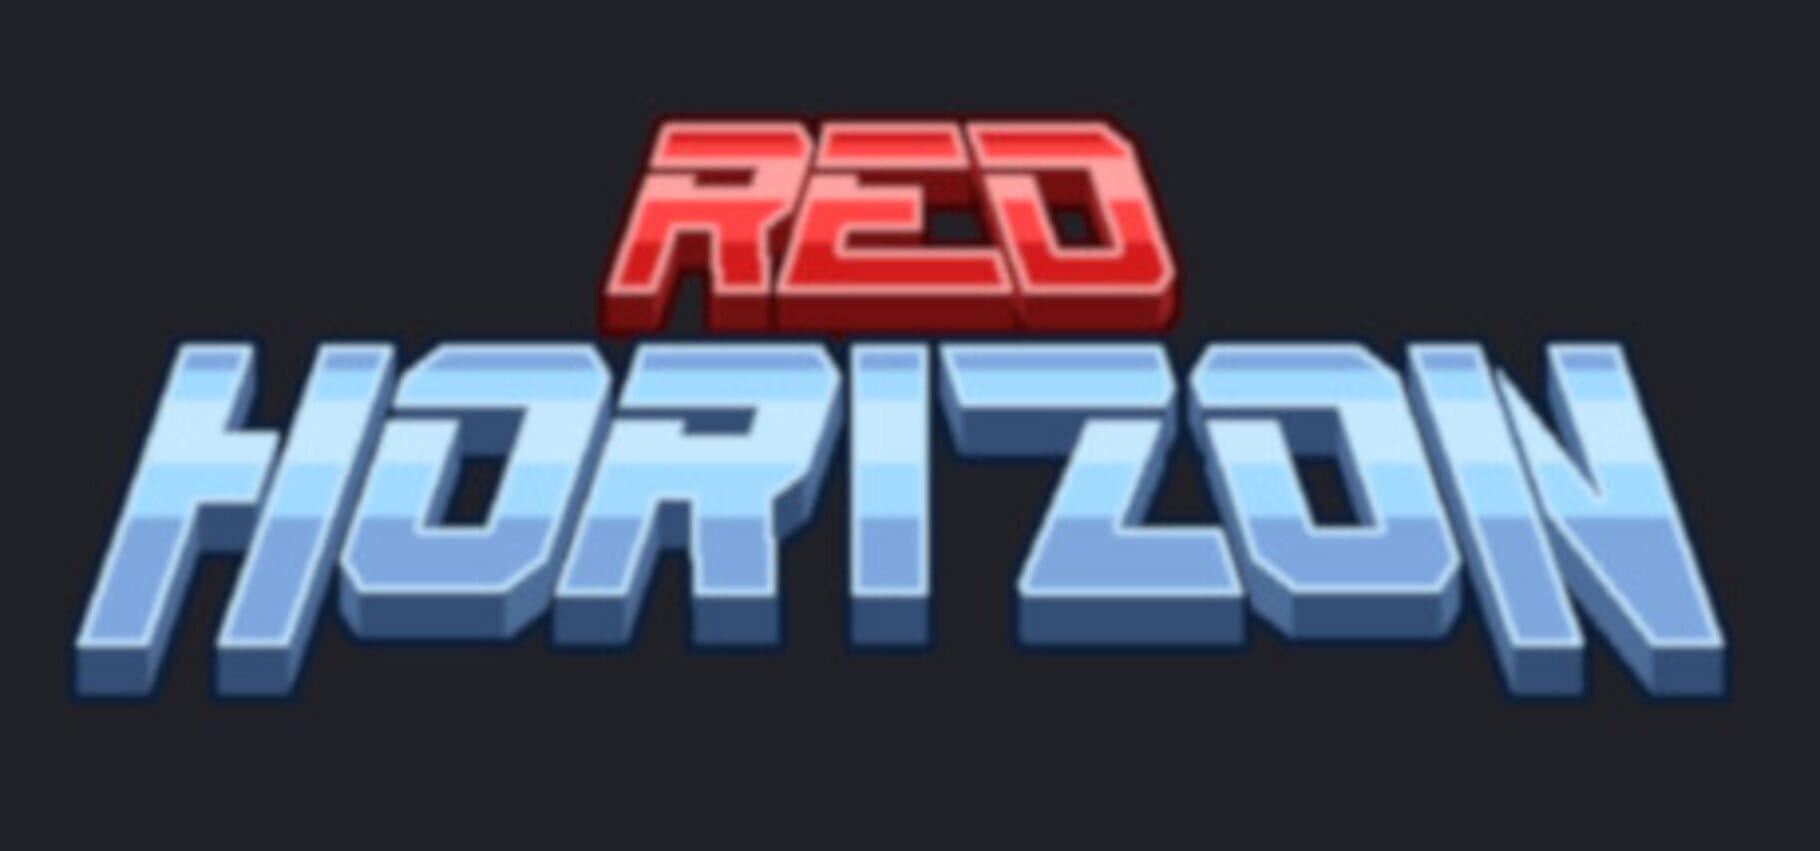 buy Red Horizon cd key for all platform